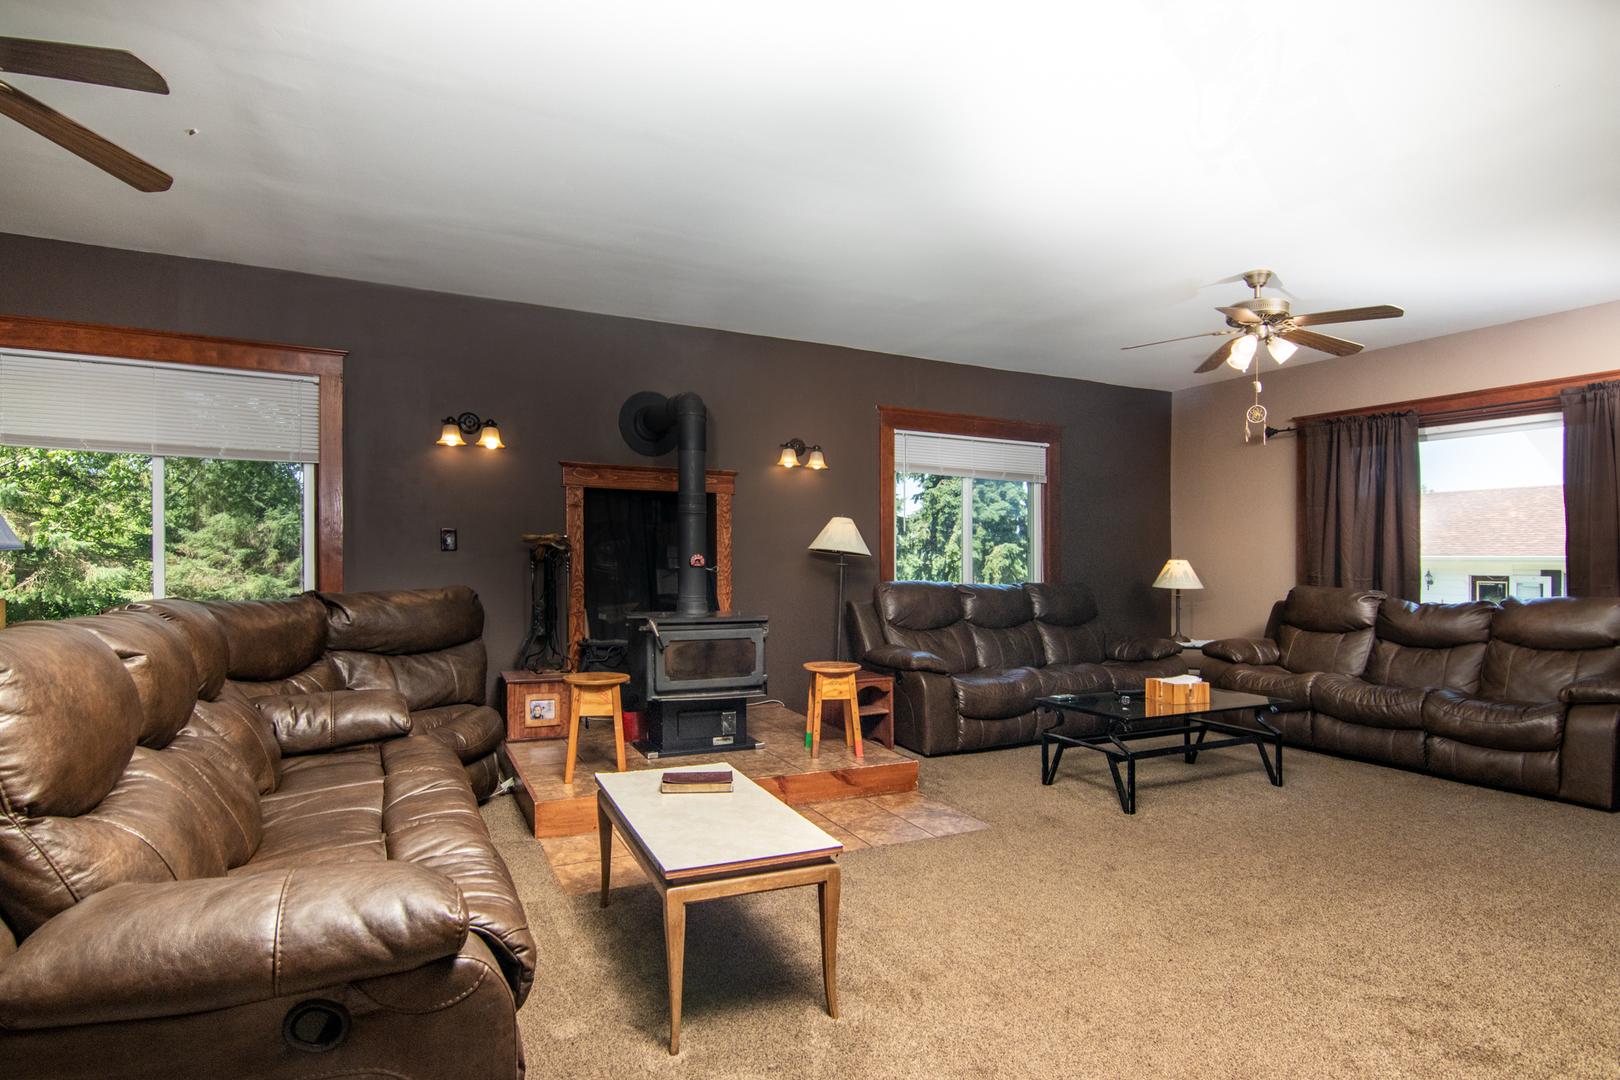 2520 Rockton, Caledonia, Illinois, 61011